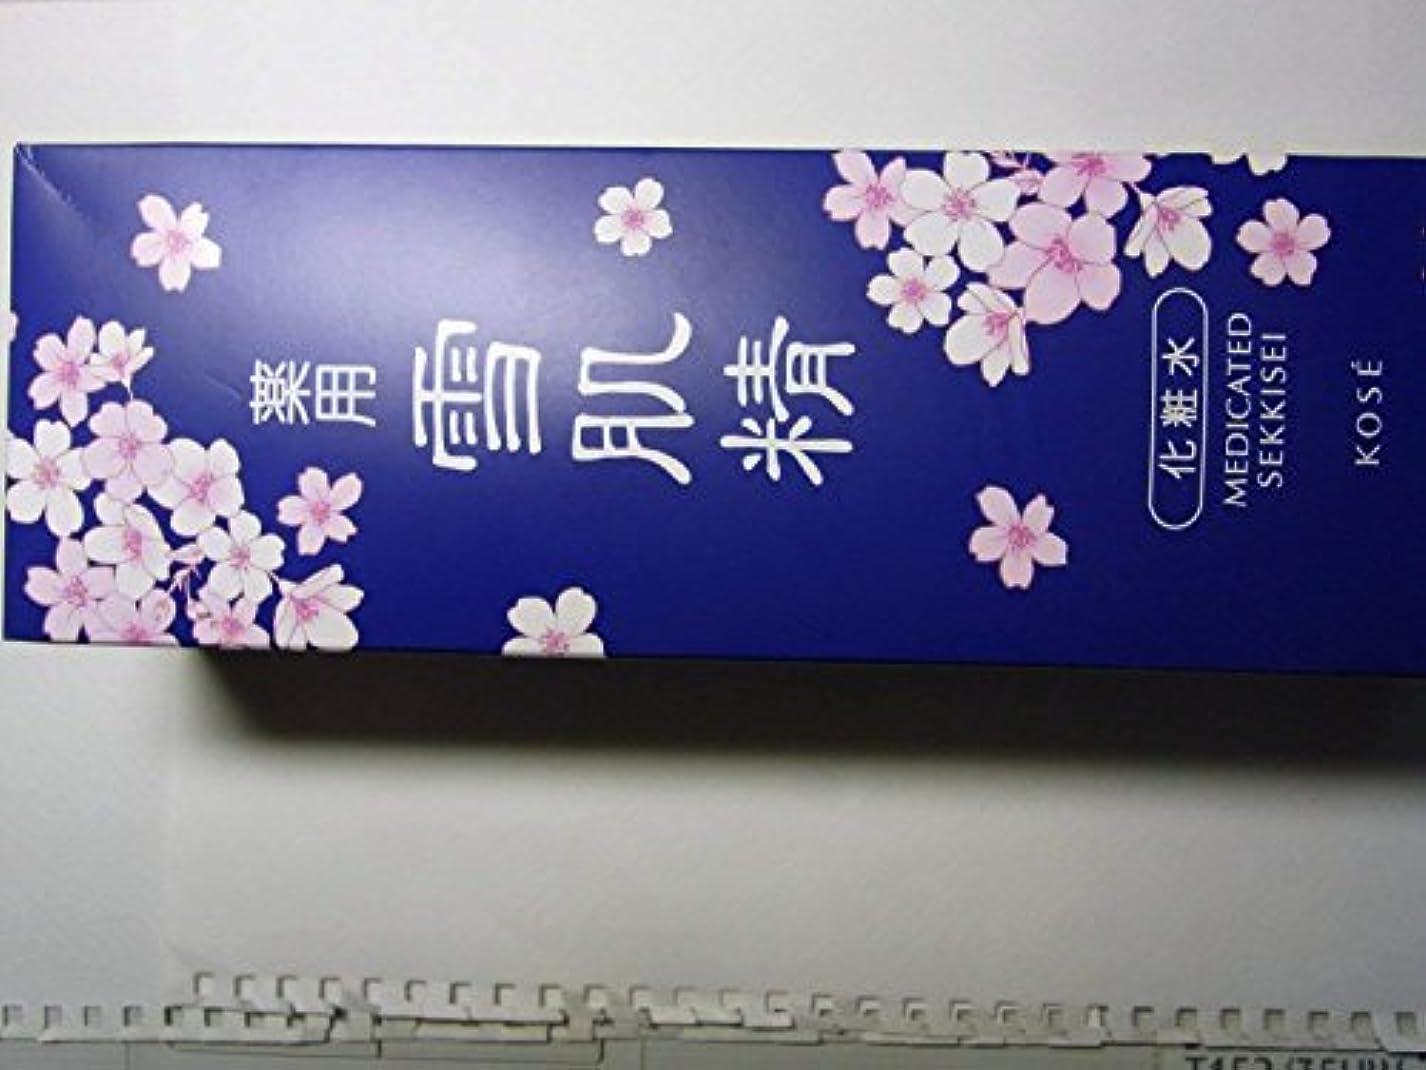 KOSE 薬用 雪肌精 化粧水500ml(桜デザイン限定ボトル)